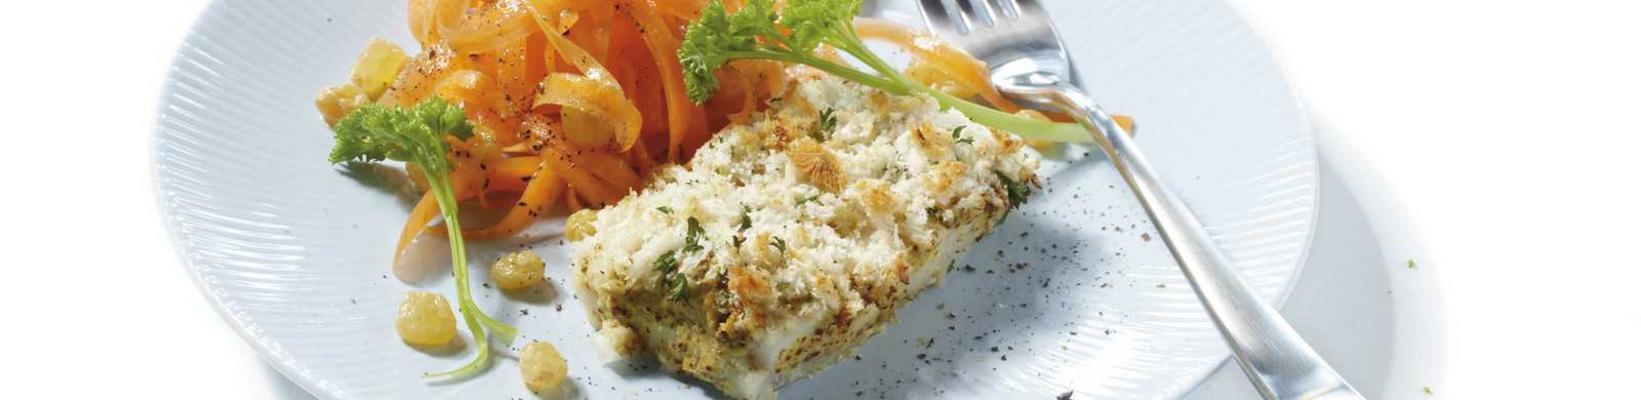 crispy pollock with carrot salad